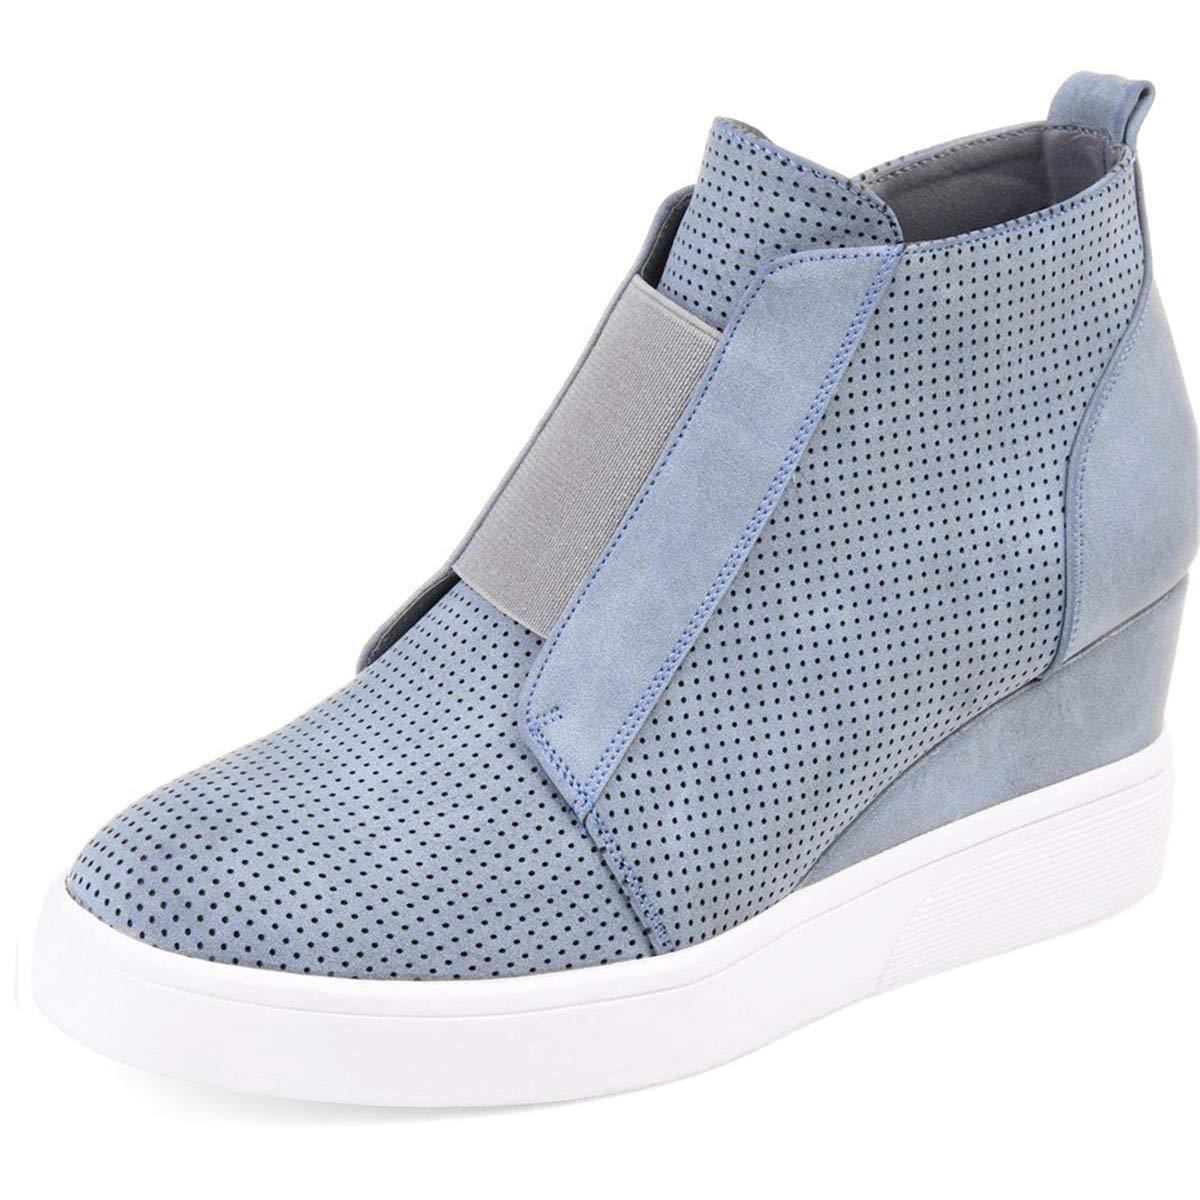 Huiyuzhi Womens Wedges Fashion Sneakers Strap High Top Closed Toe Platform Shoes with Zipper